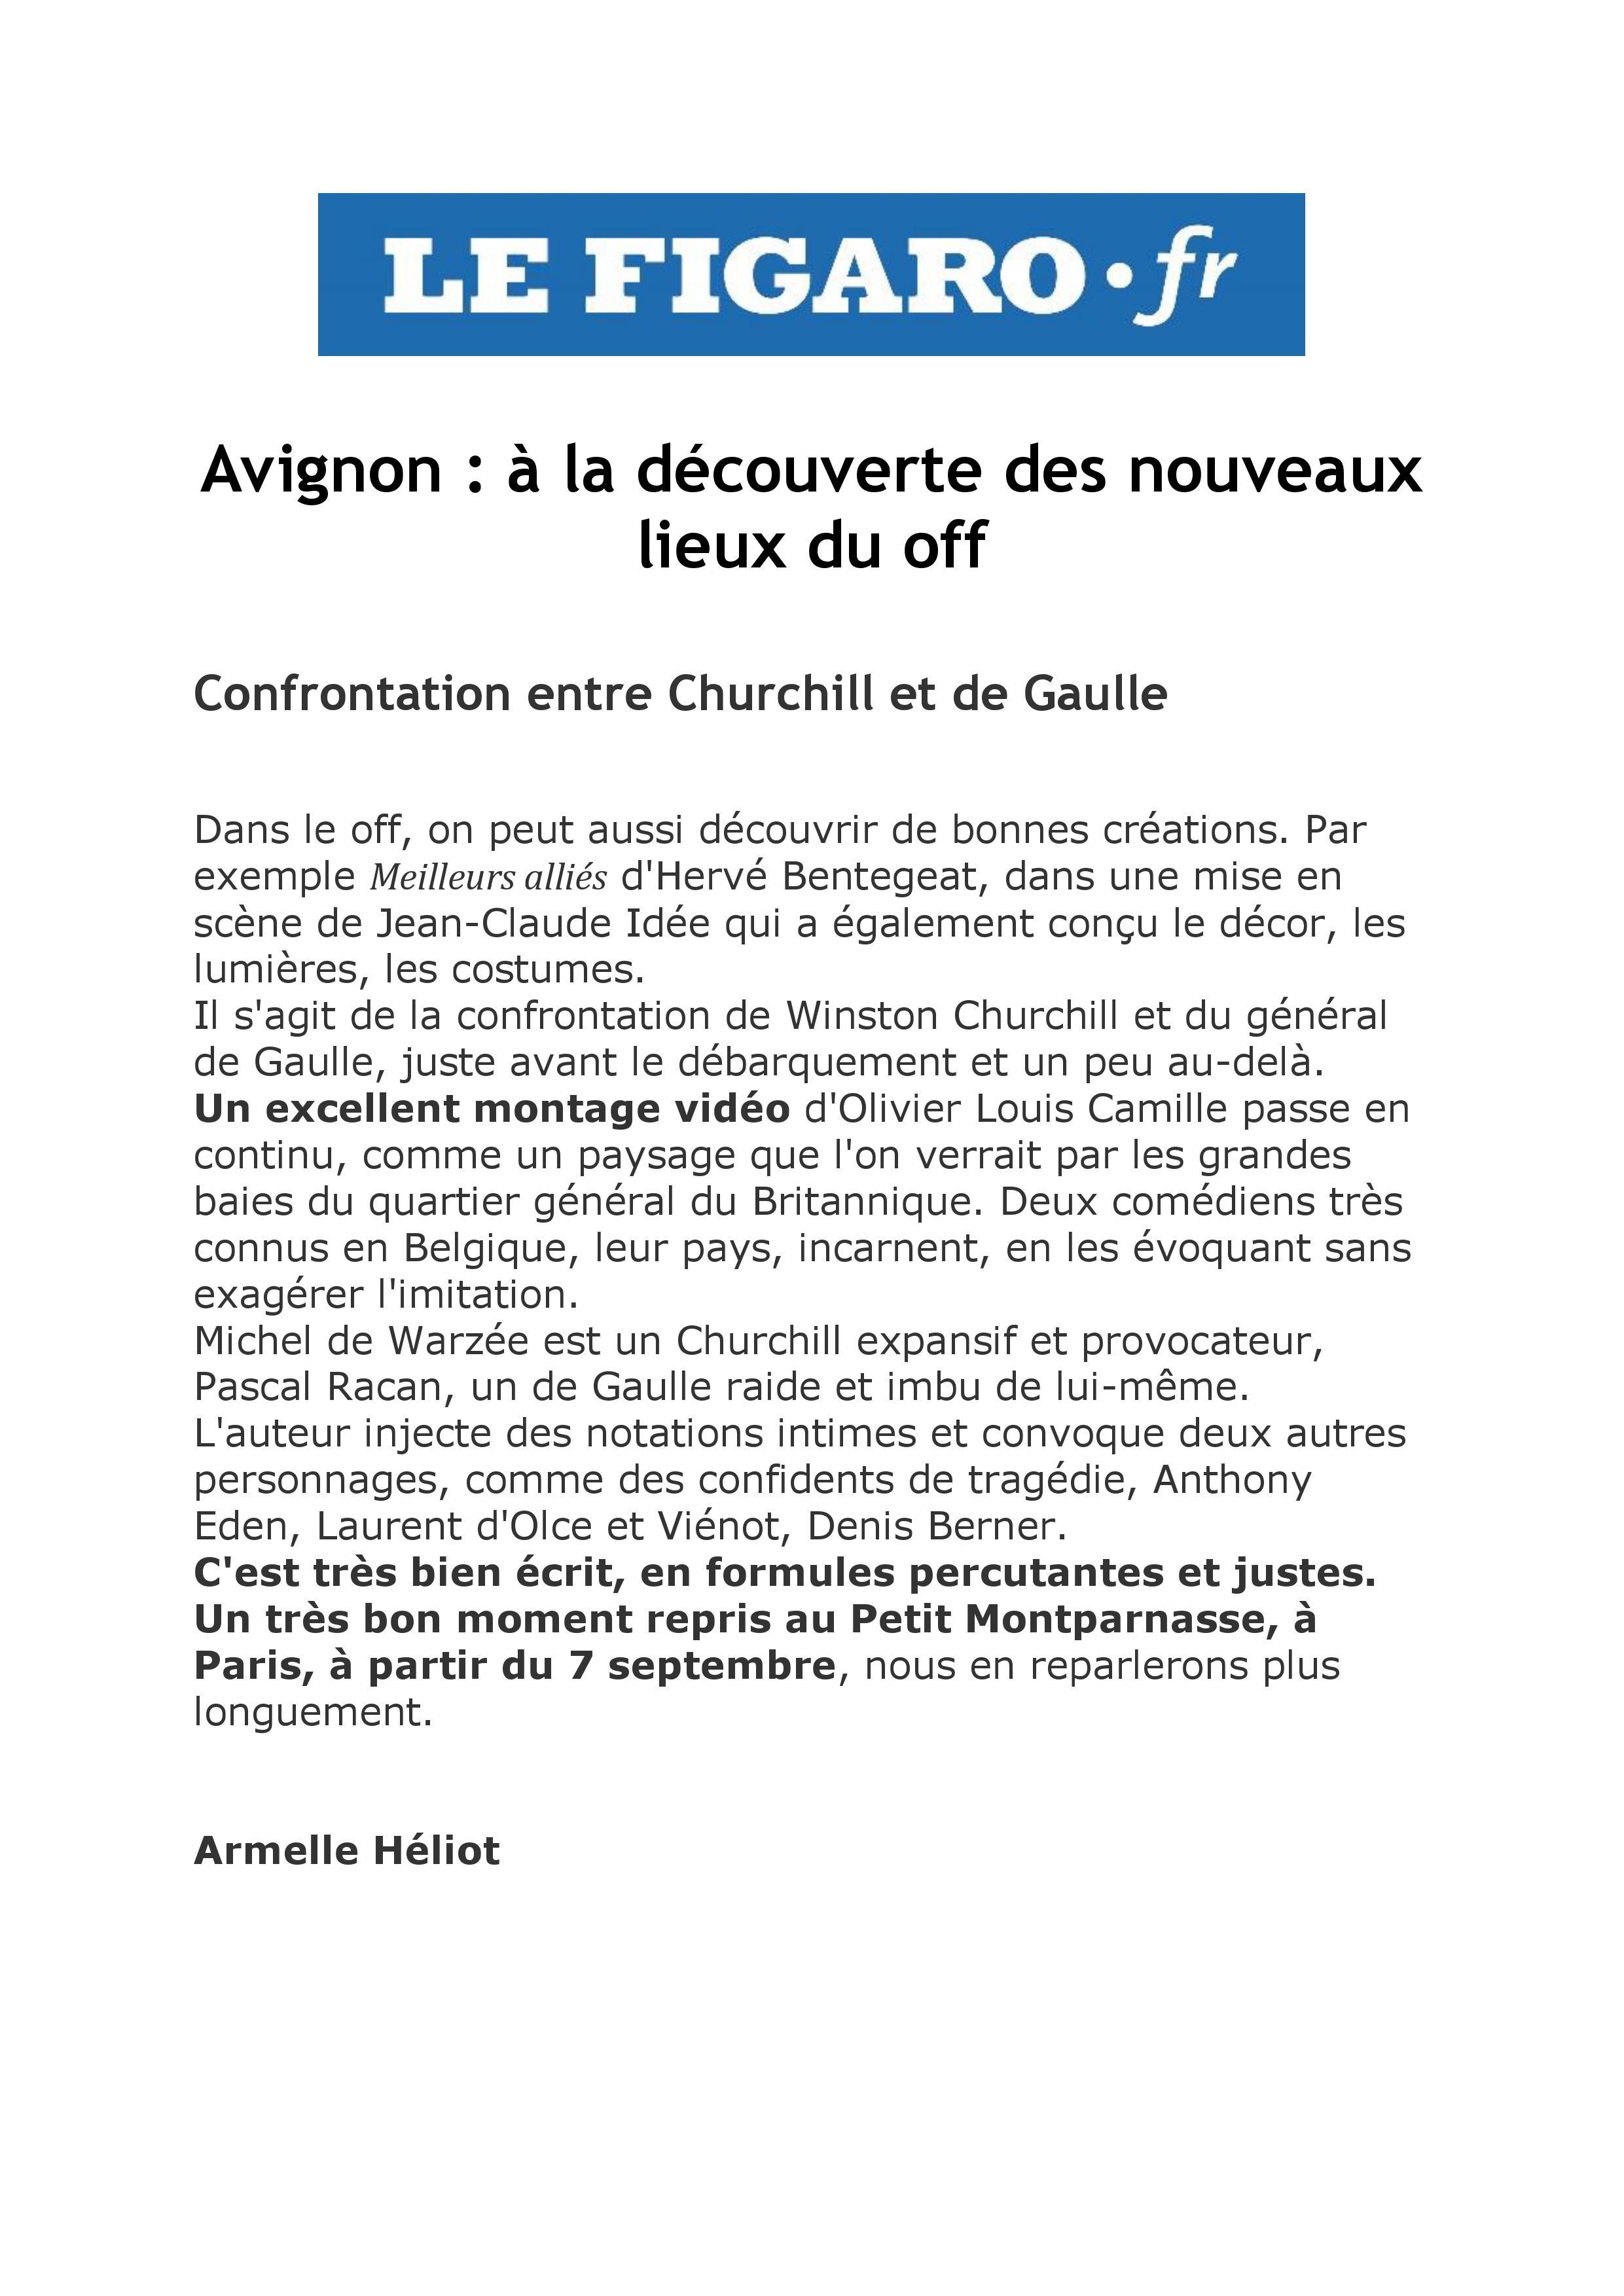 Le Figaro fr